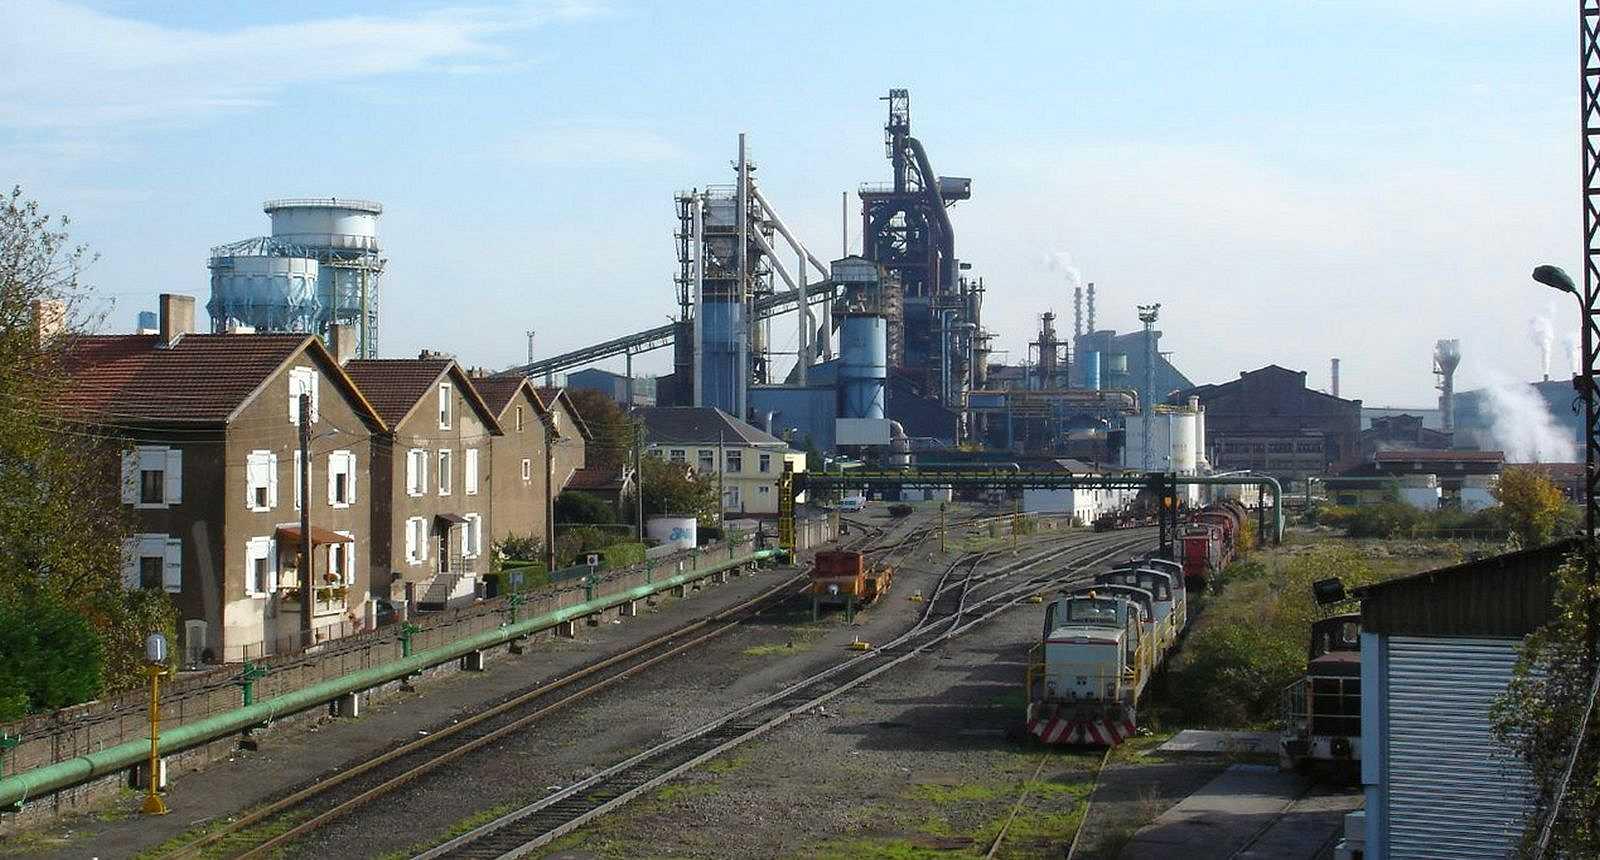 L'usine sidérurgique d'Hayange